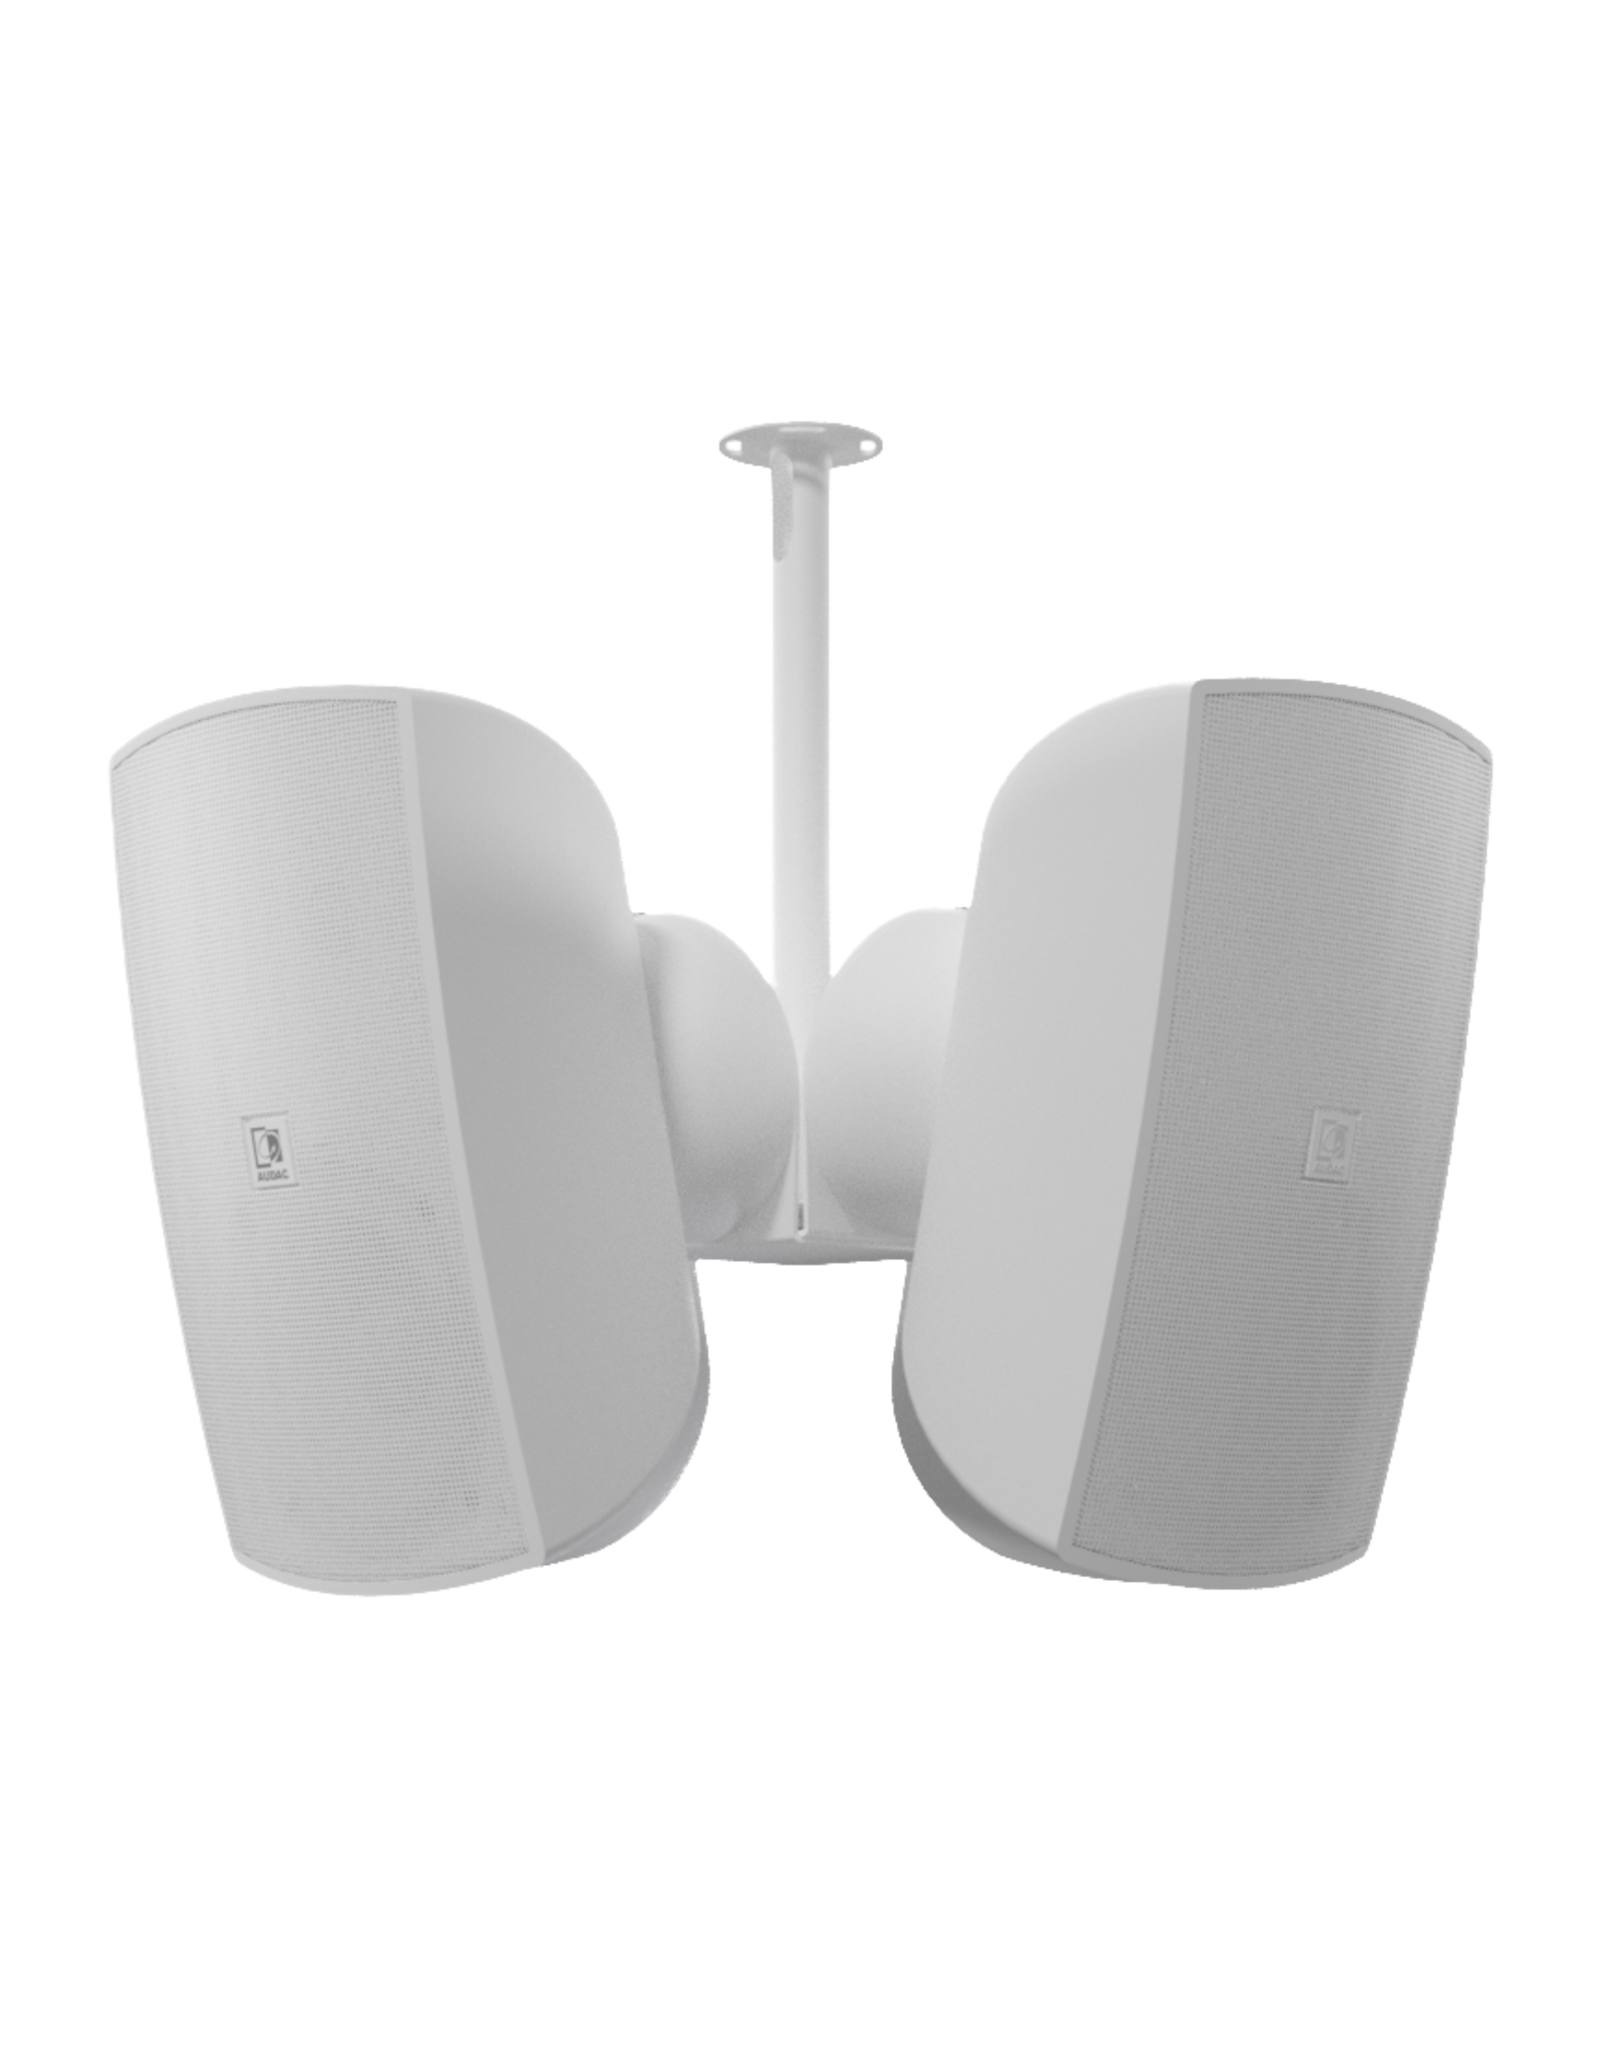 Audac Cluster mounting set 4 x ATEO6 speaker White